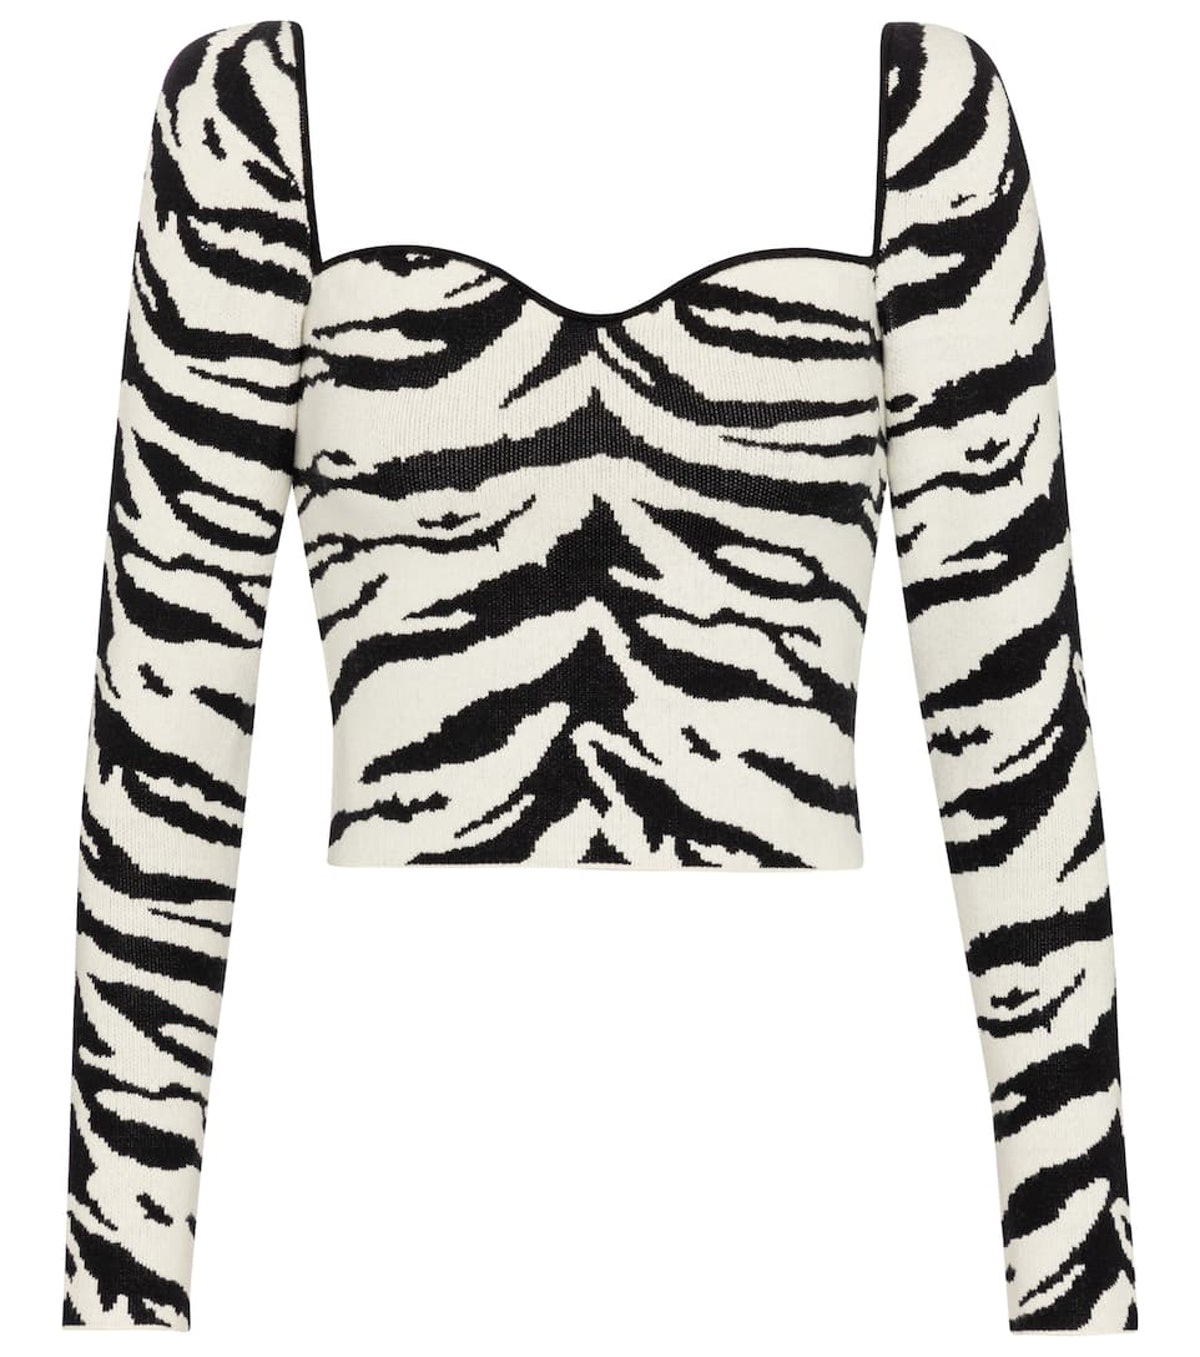 Zebra-print cotton-blend crop top